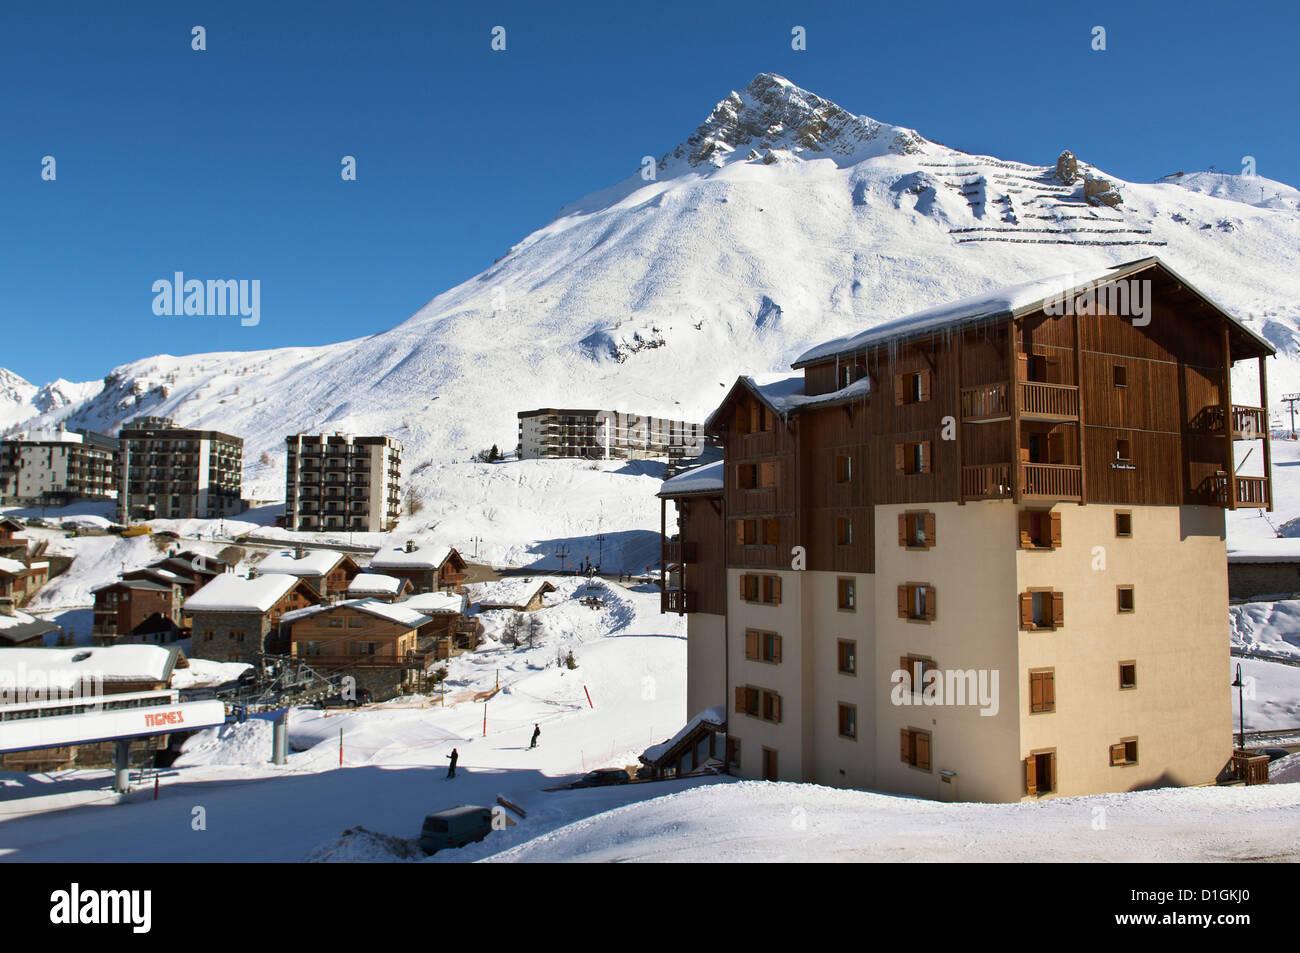 Alpine Ski resort, Tignes-le-Lac, Tignes, Savoie, Rhone-Alpes, French Alps, France, Europe Stock Photo